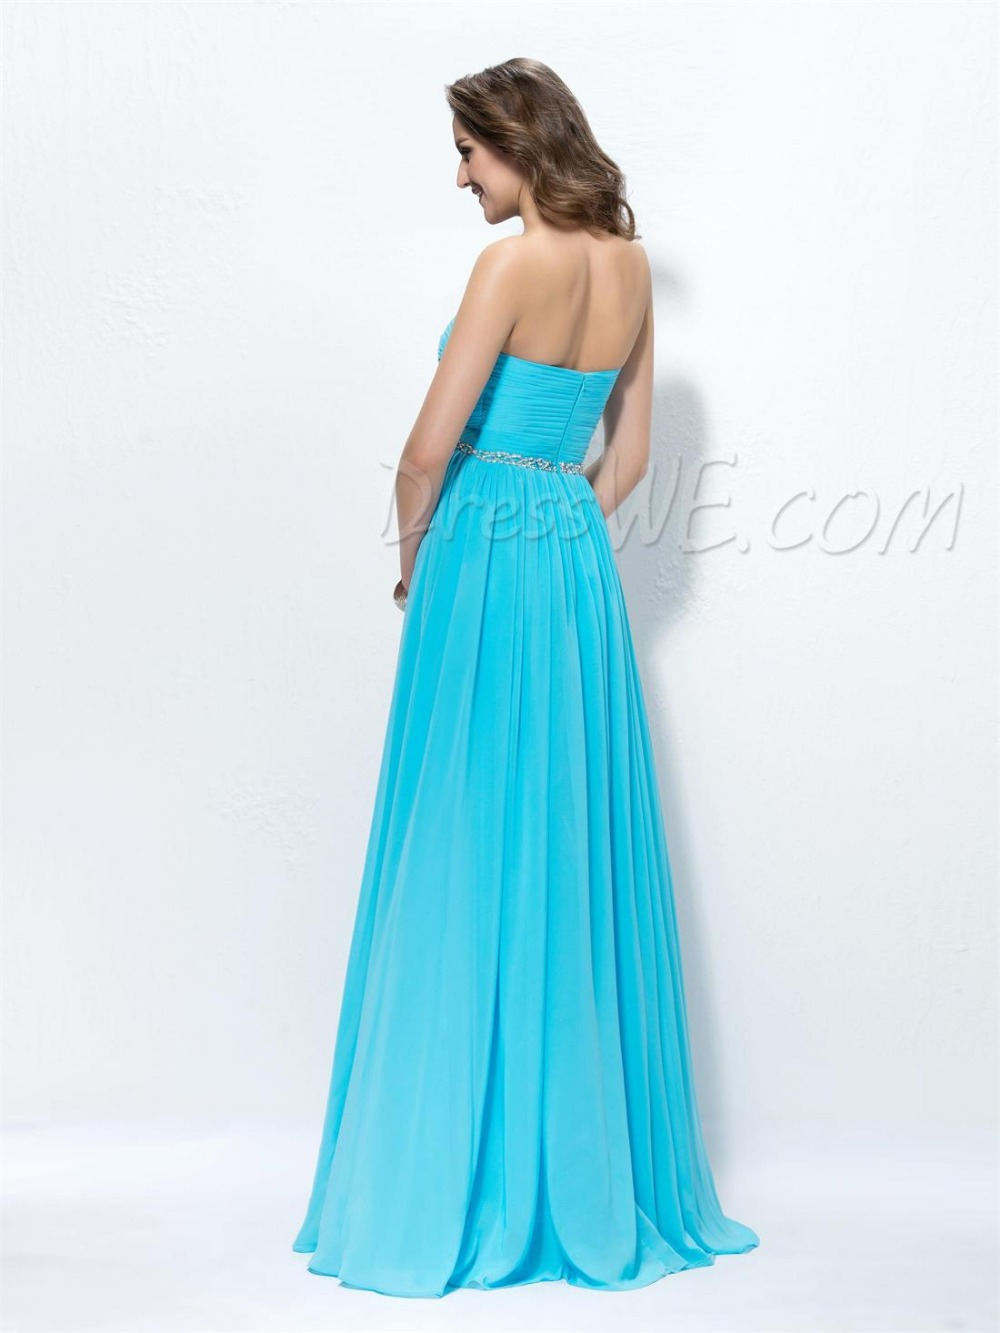 Long Cheap Bridesmaid Dress Plus Size For Casual Women Weddings ...